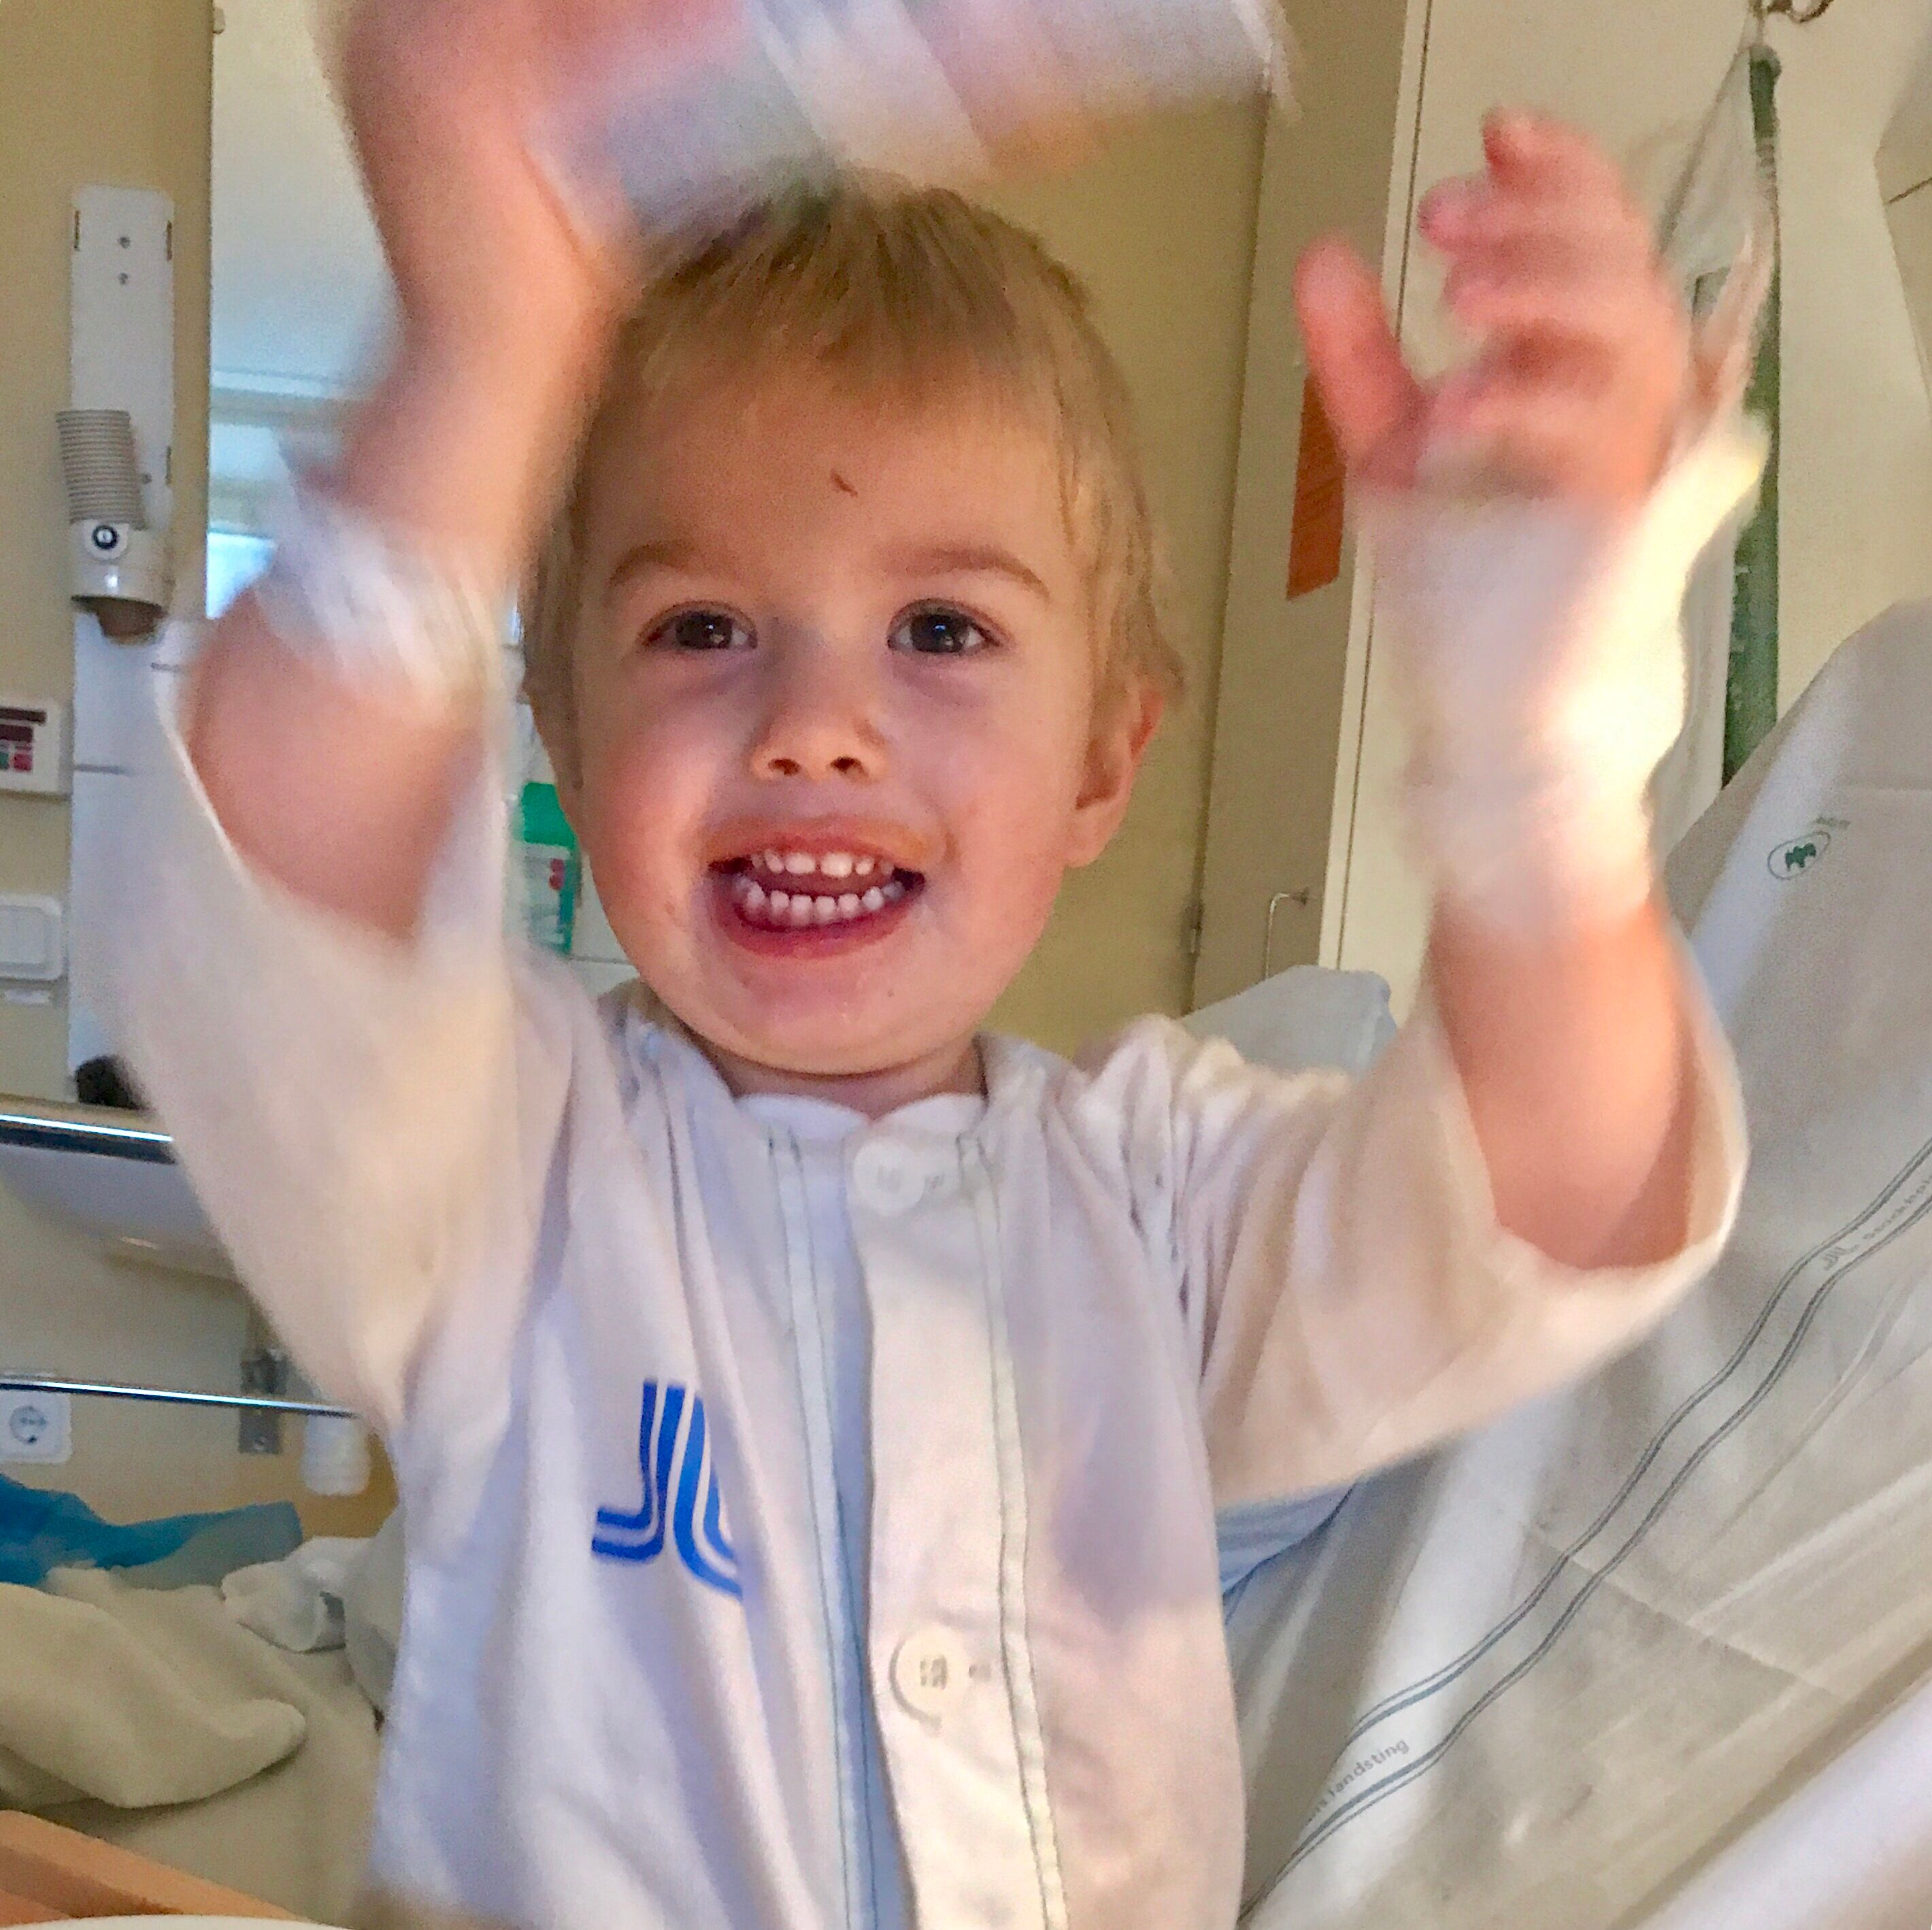 Harry applåderar Huddinge sjukhus